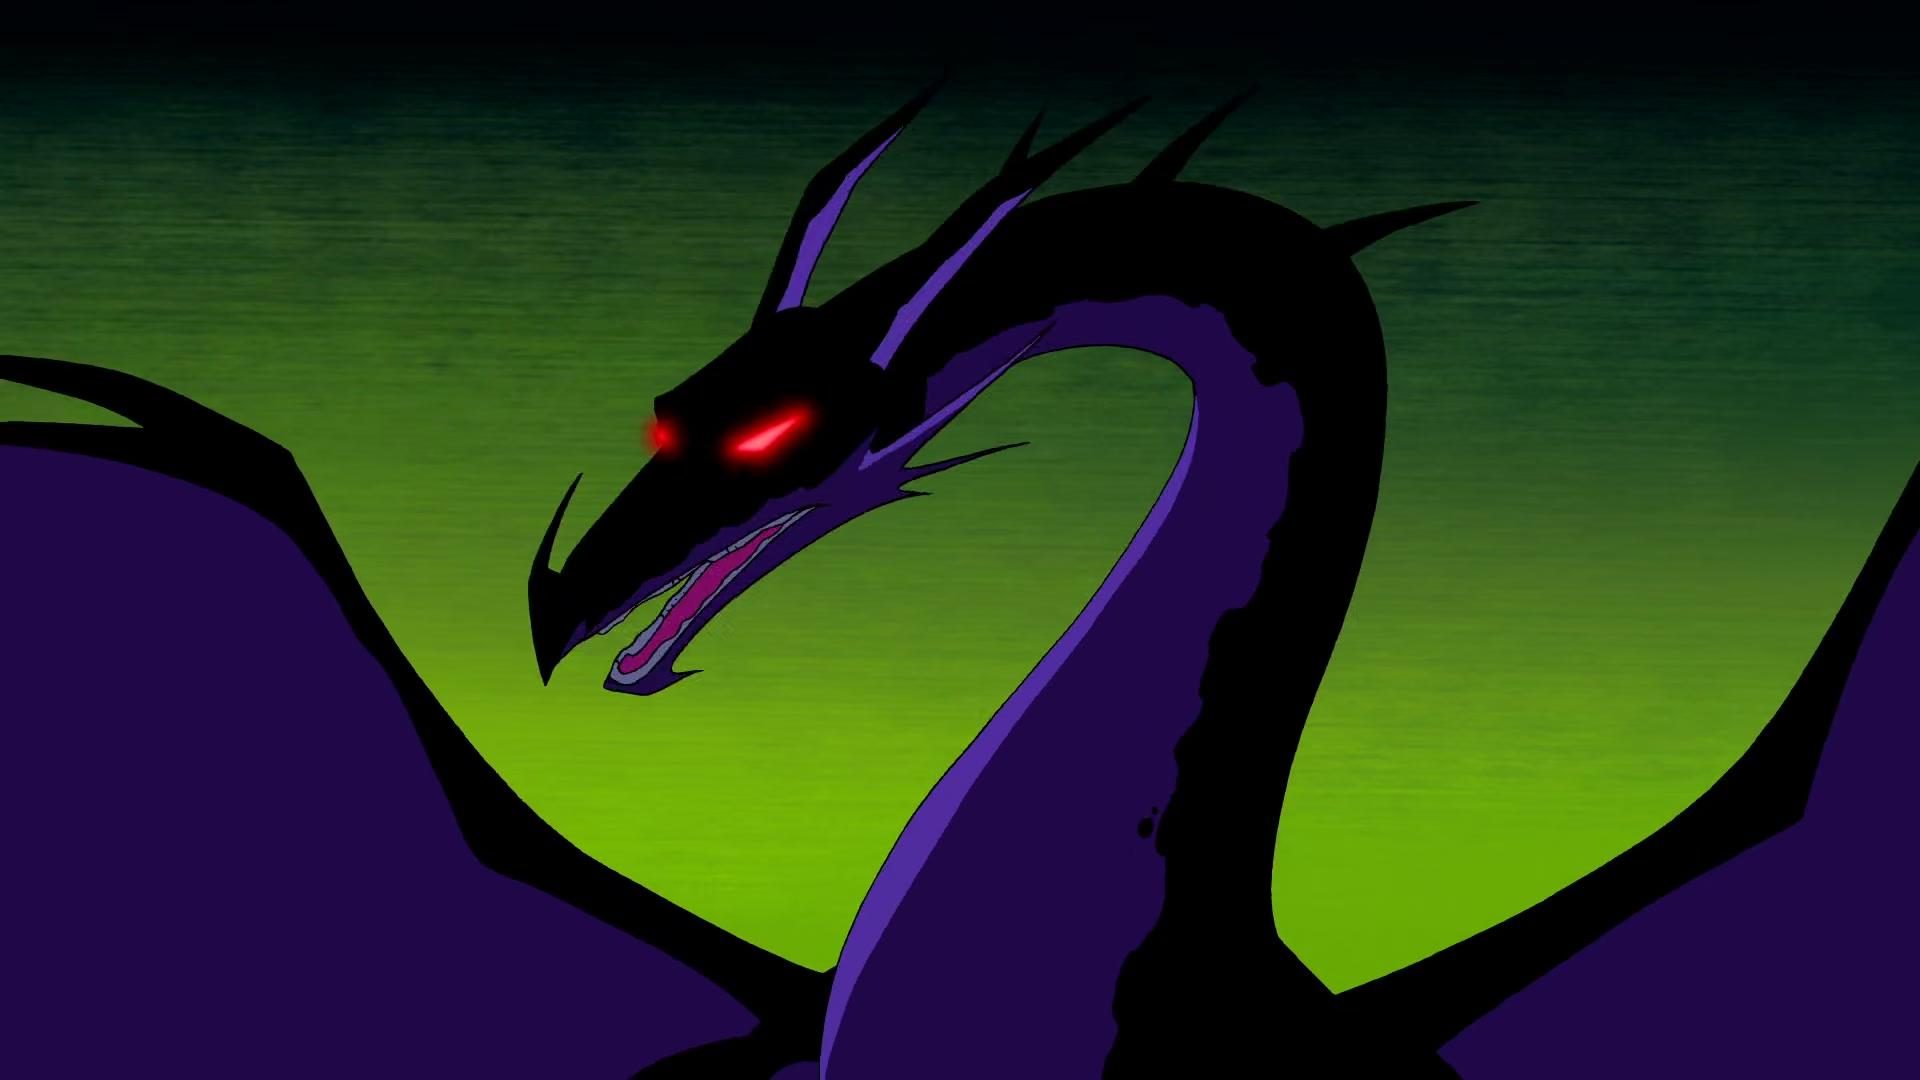 Dragon europe bad Bad dragon